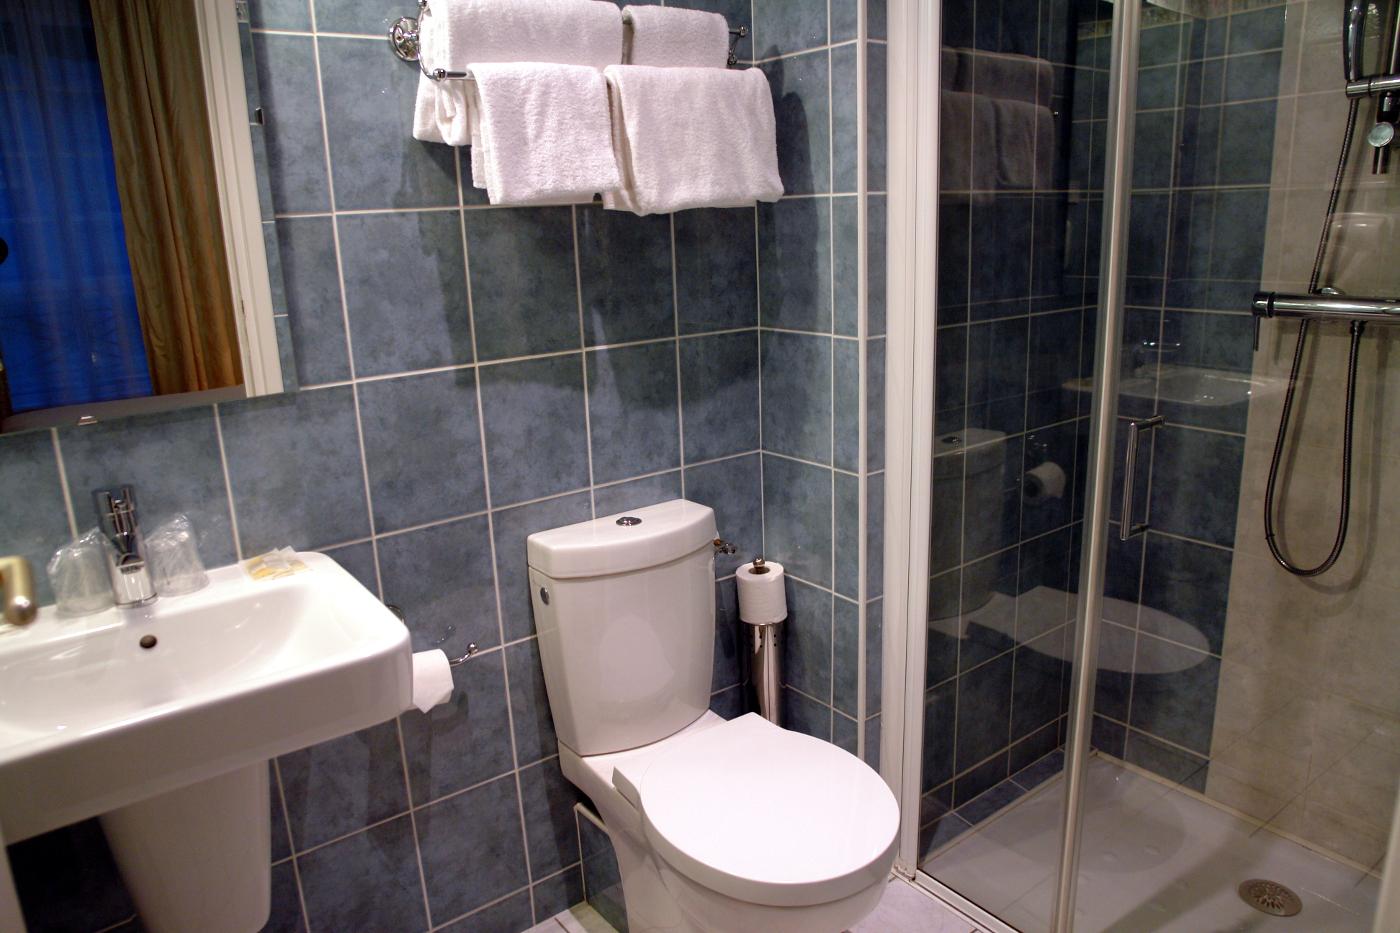 salle de bain hotel vauban brest ciel bretagne. Black Bedroom Furniture Sets. Home Design Ideas